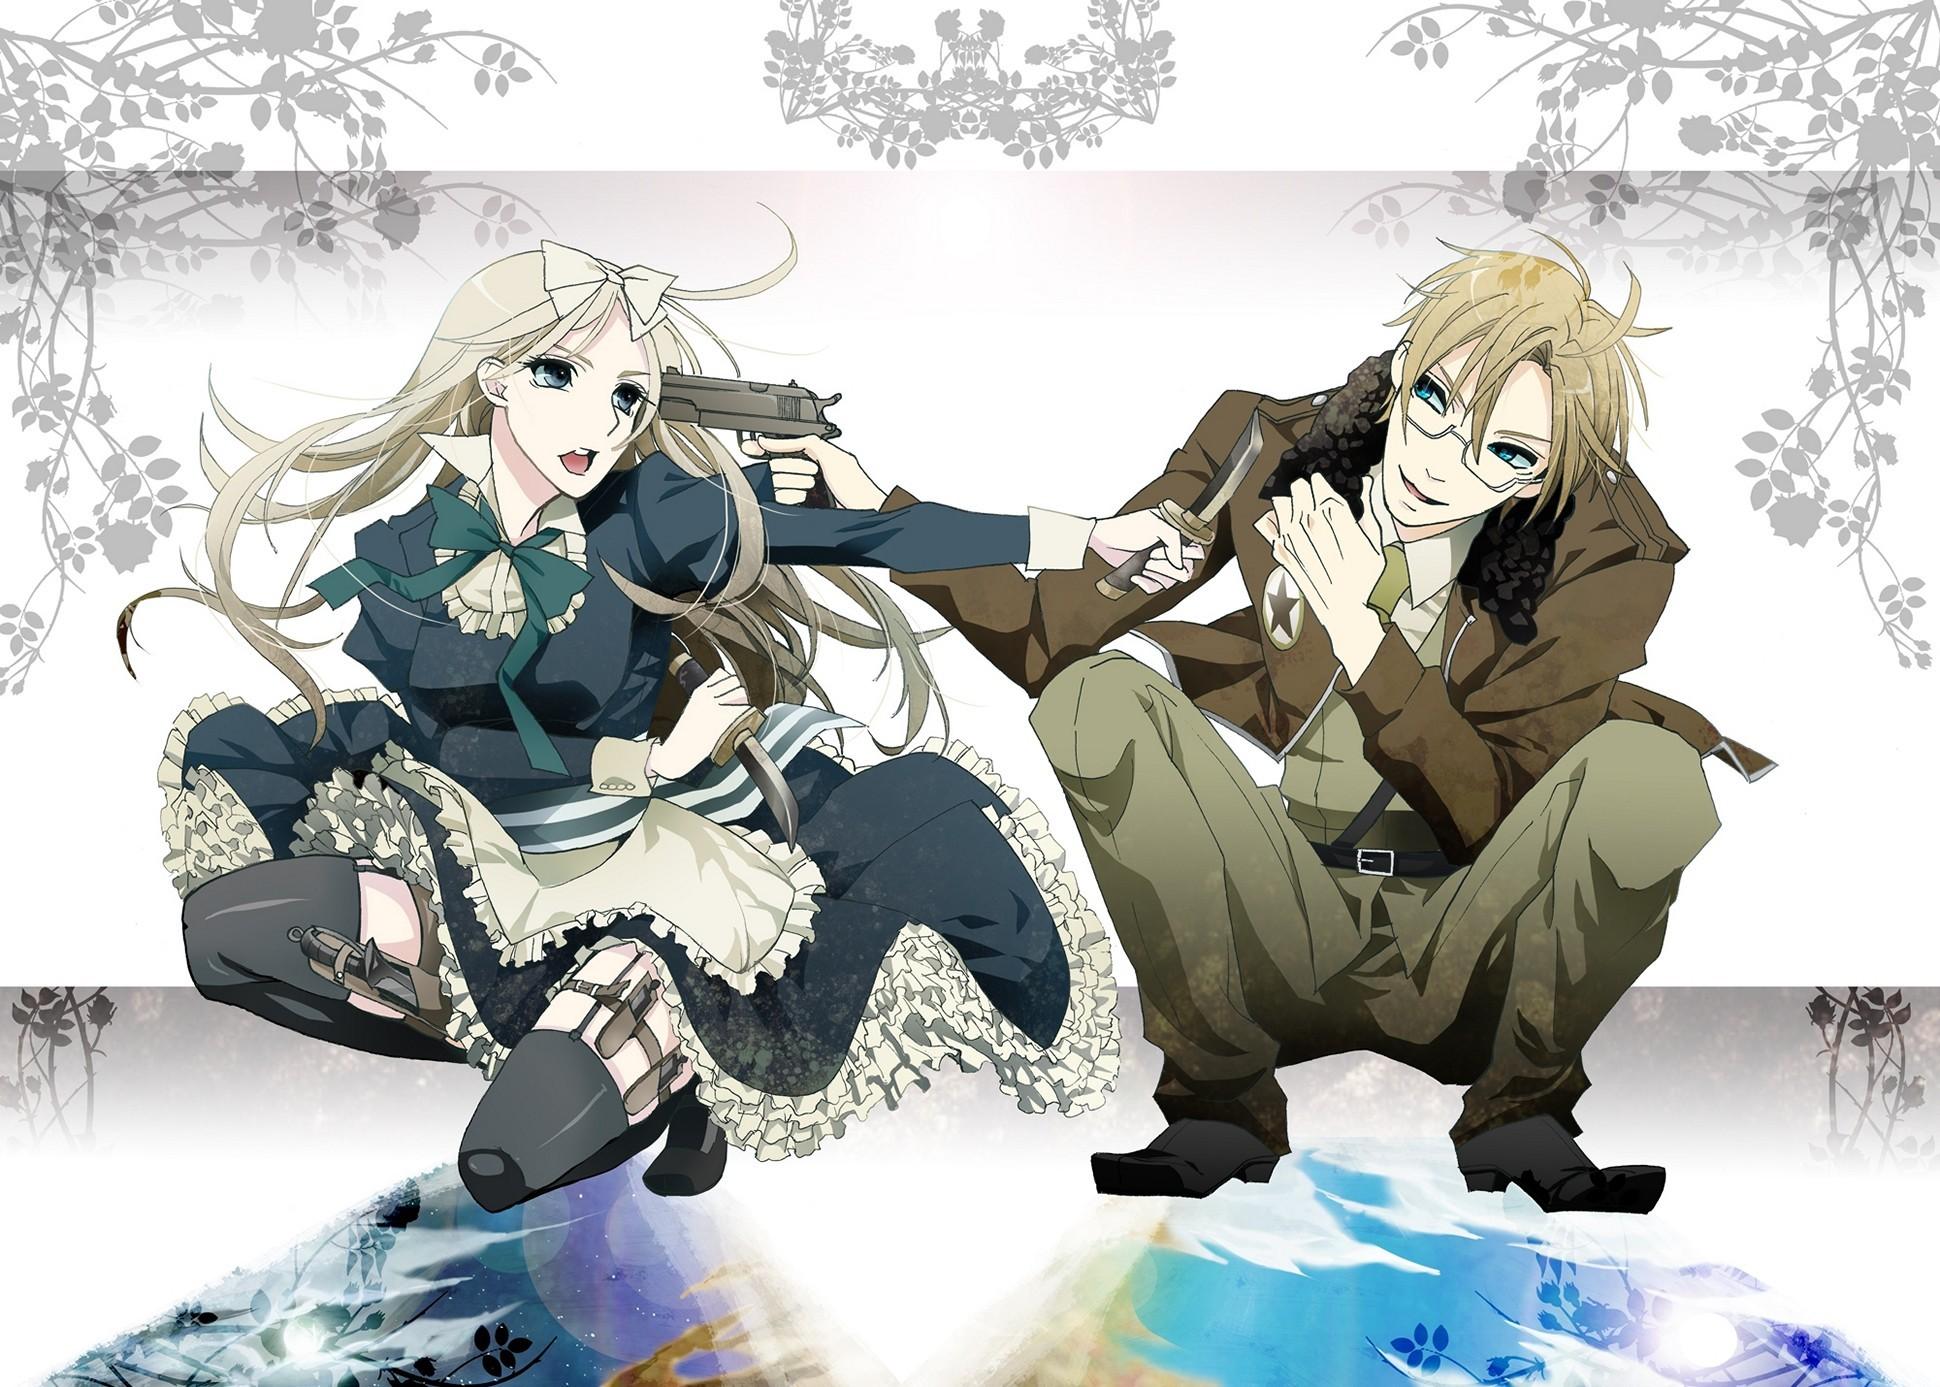 Hetalia Axis Powers Boy Girl Threats Weapons Inspired Anime Music Wallpaper